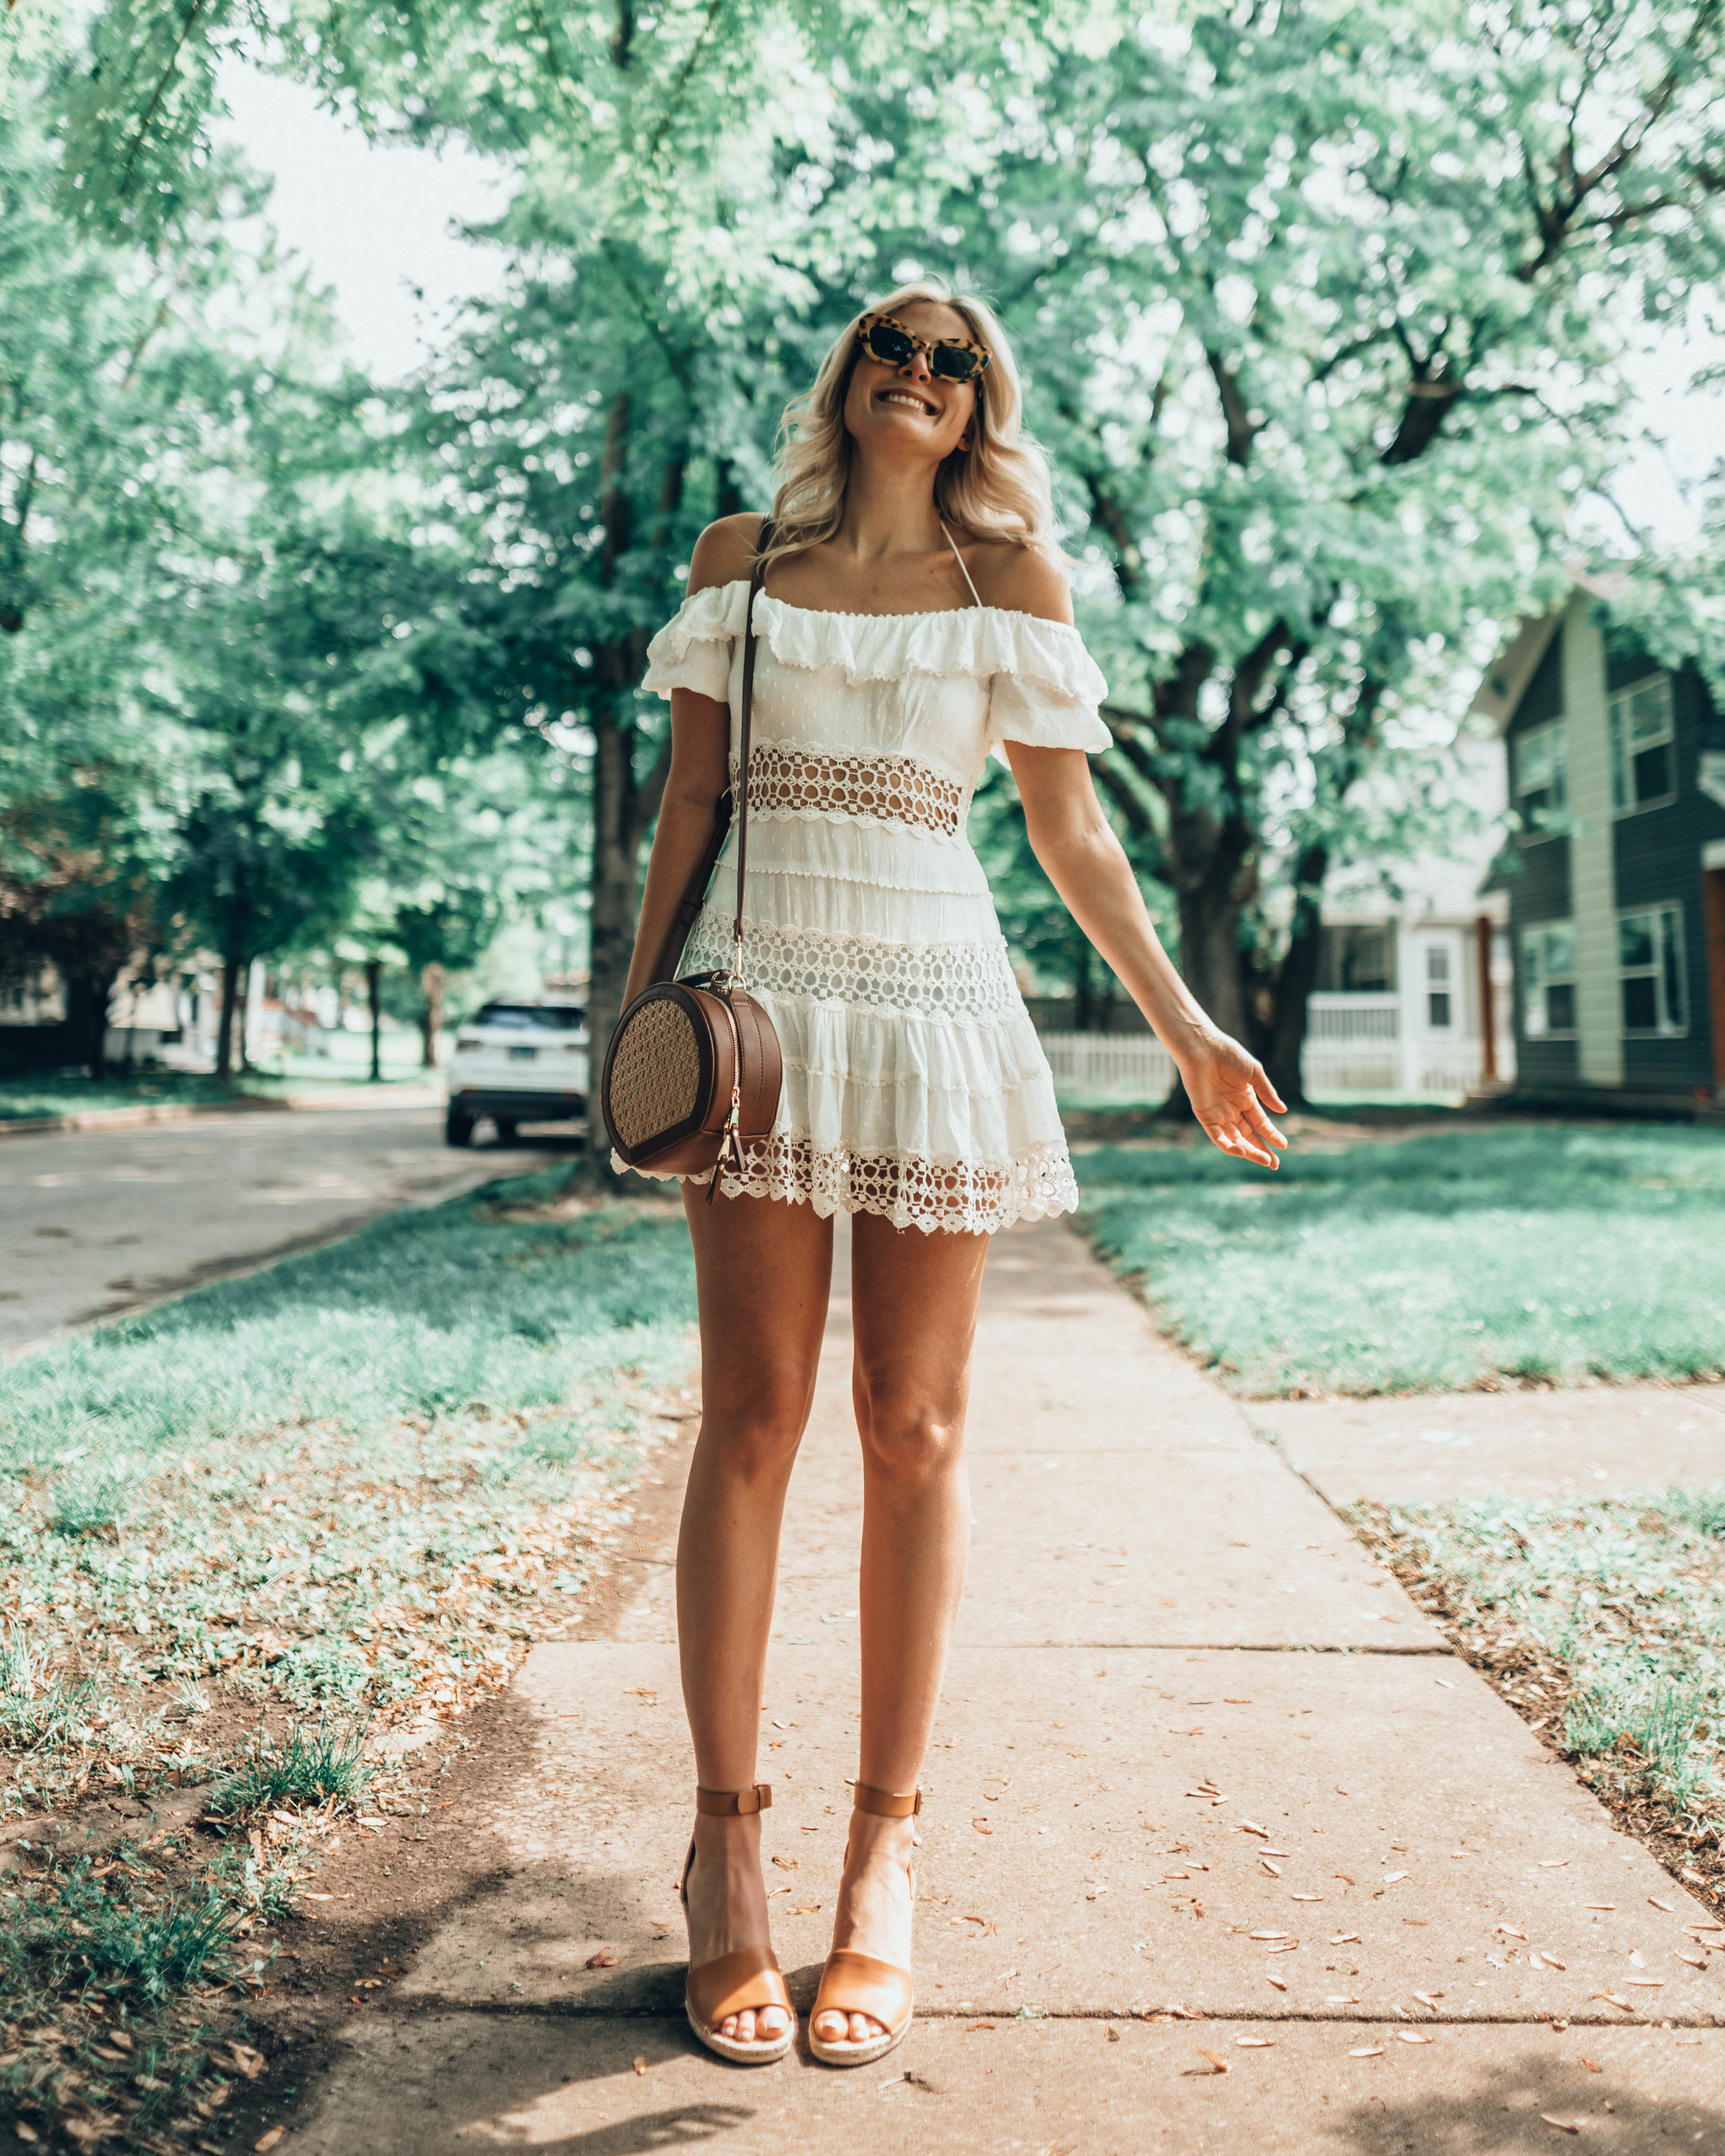 LOOK THREE - Free People Crochet-Lace Dress / Vince Camuto Leera Espadrille Wedge Sandal / I.N.C. Ajae Tan Round Crossbody / Lucky Brand Two-Tone Openwork Disc Drop Earrings